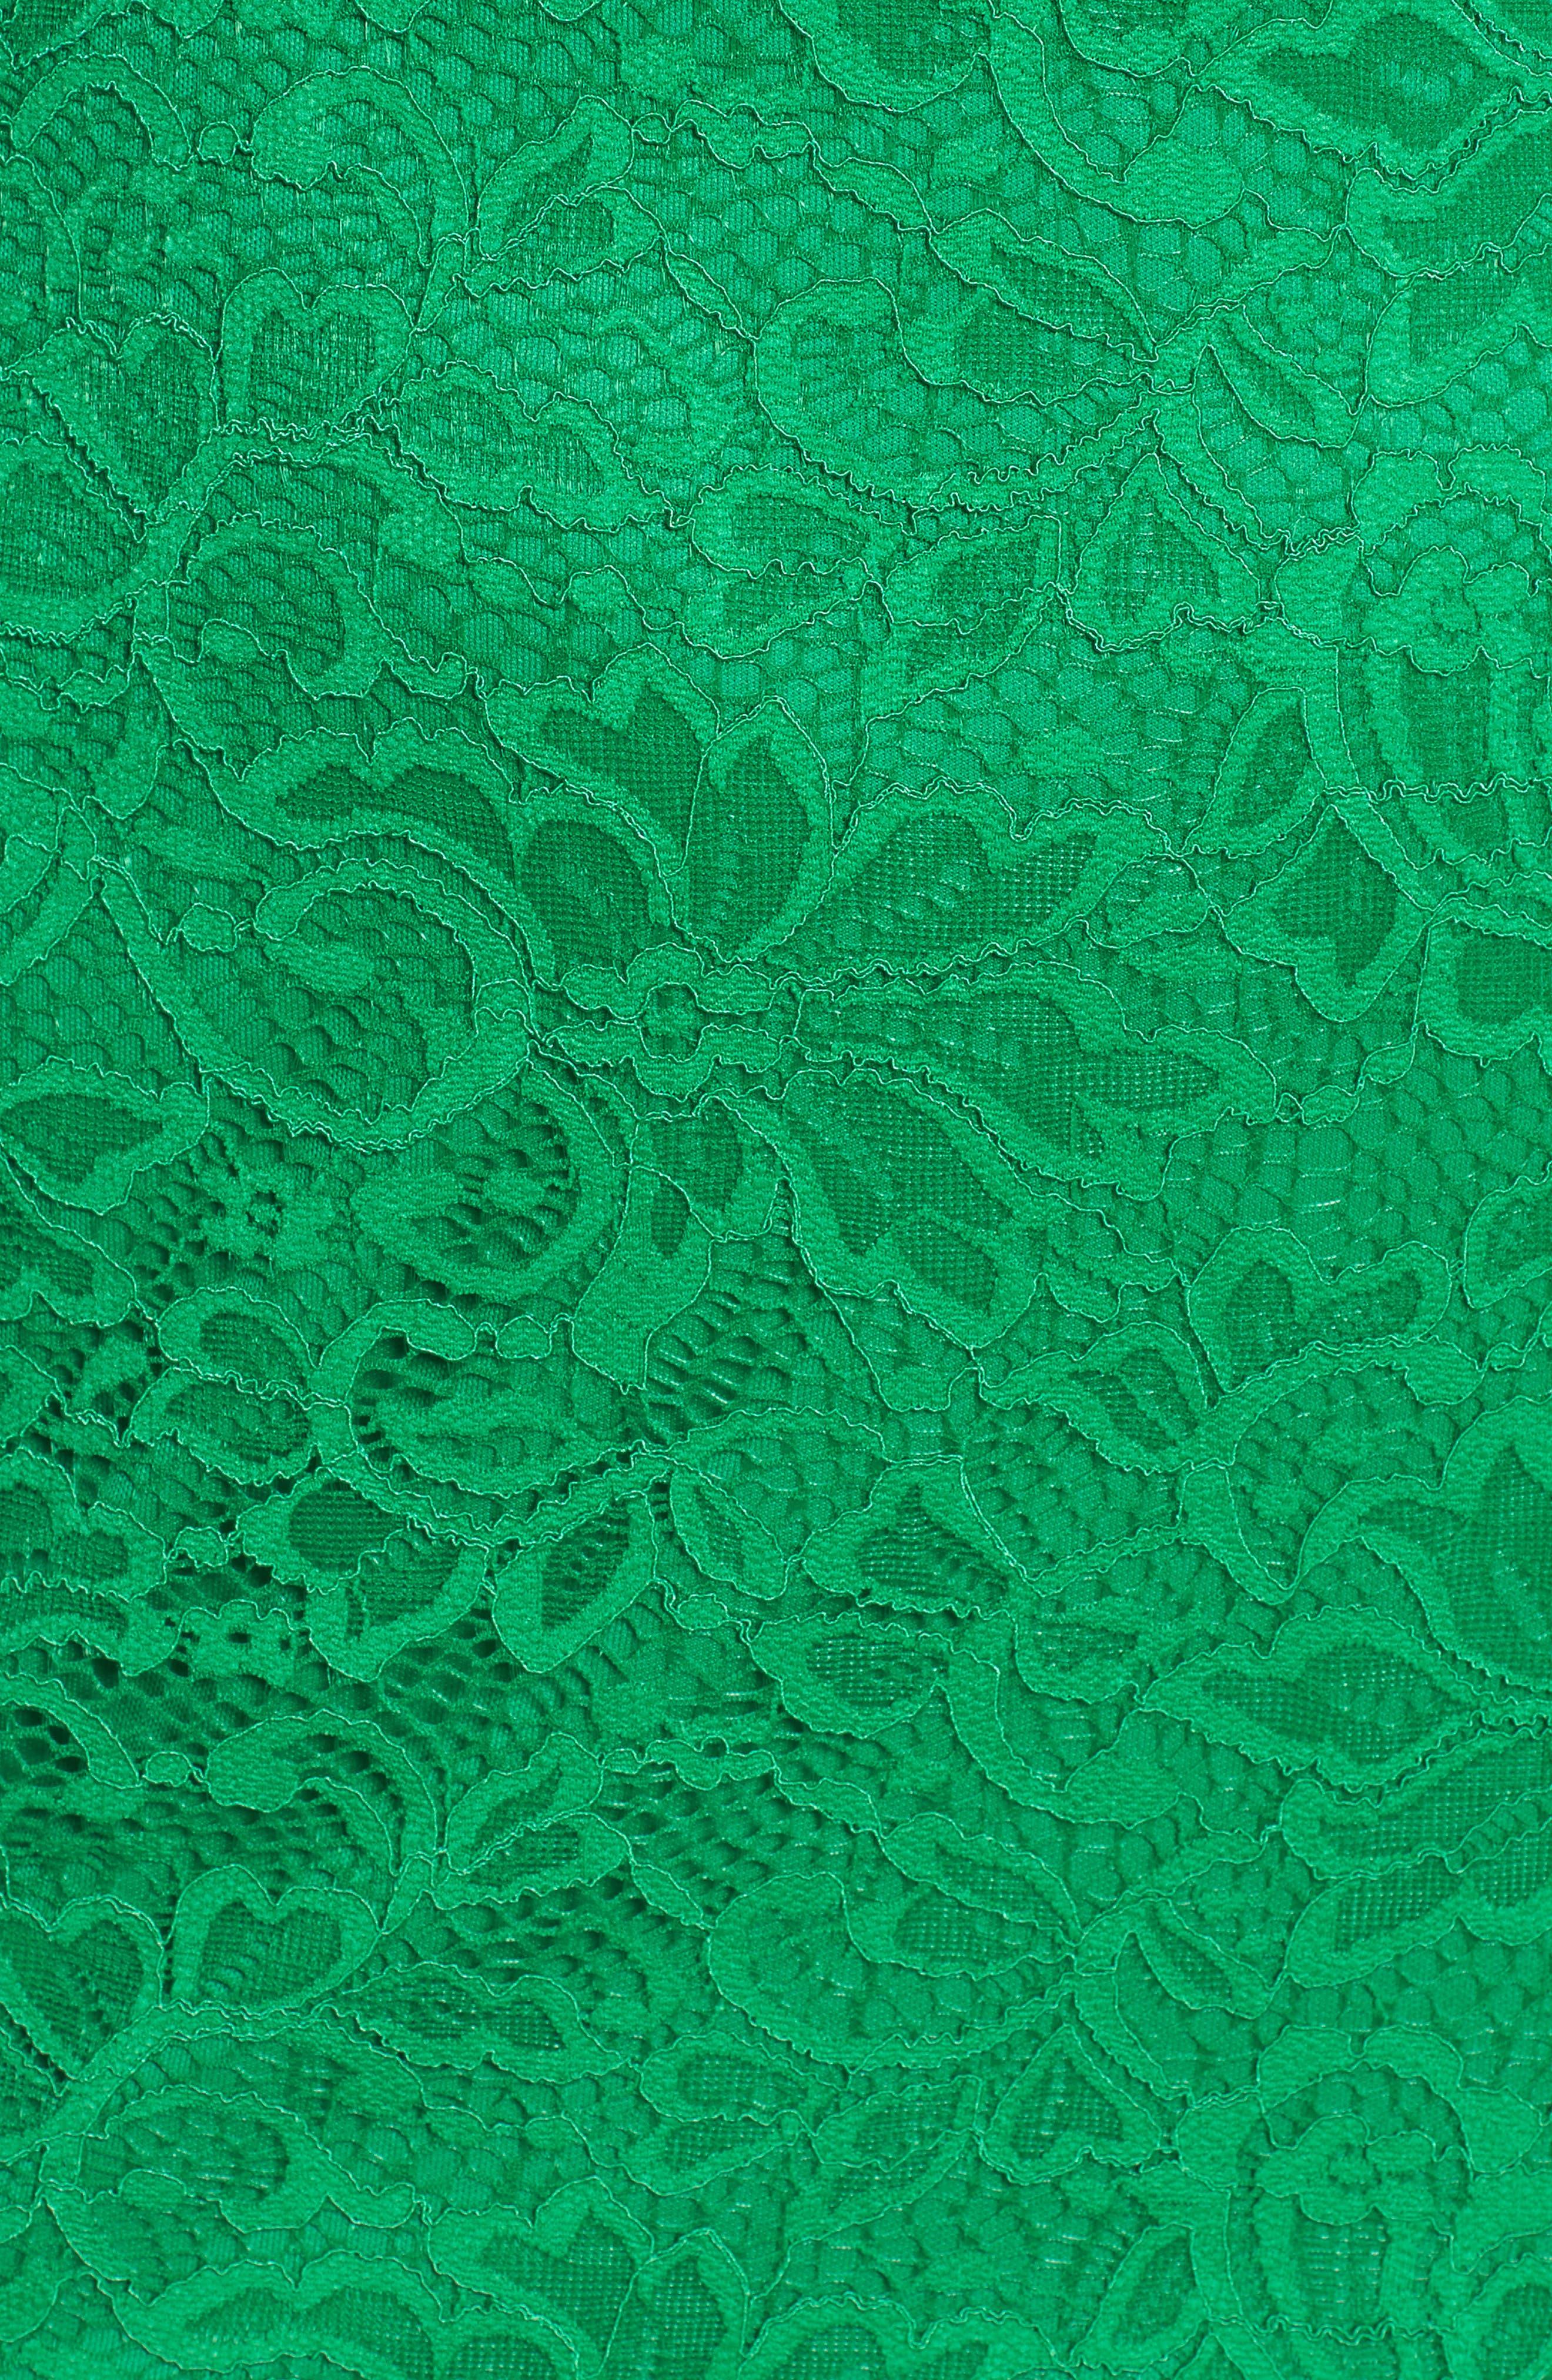 Lace Sheath Dress,                             Alternate thumbnail 5, color,                             Kelly Green